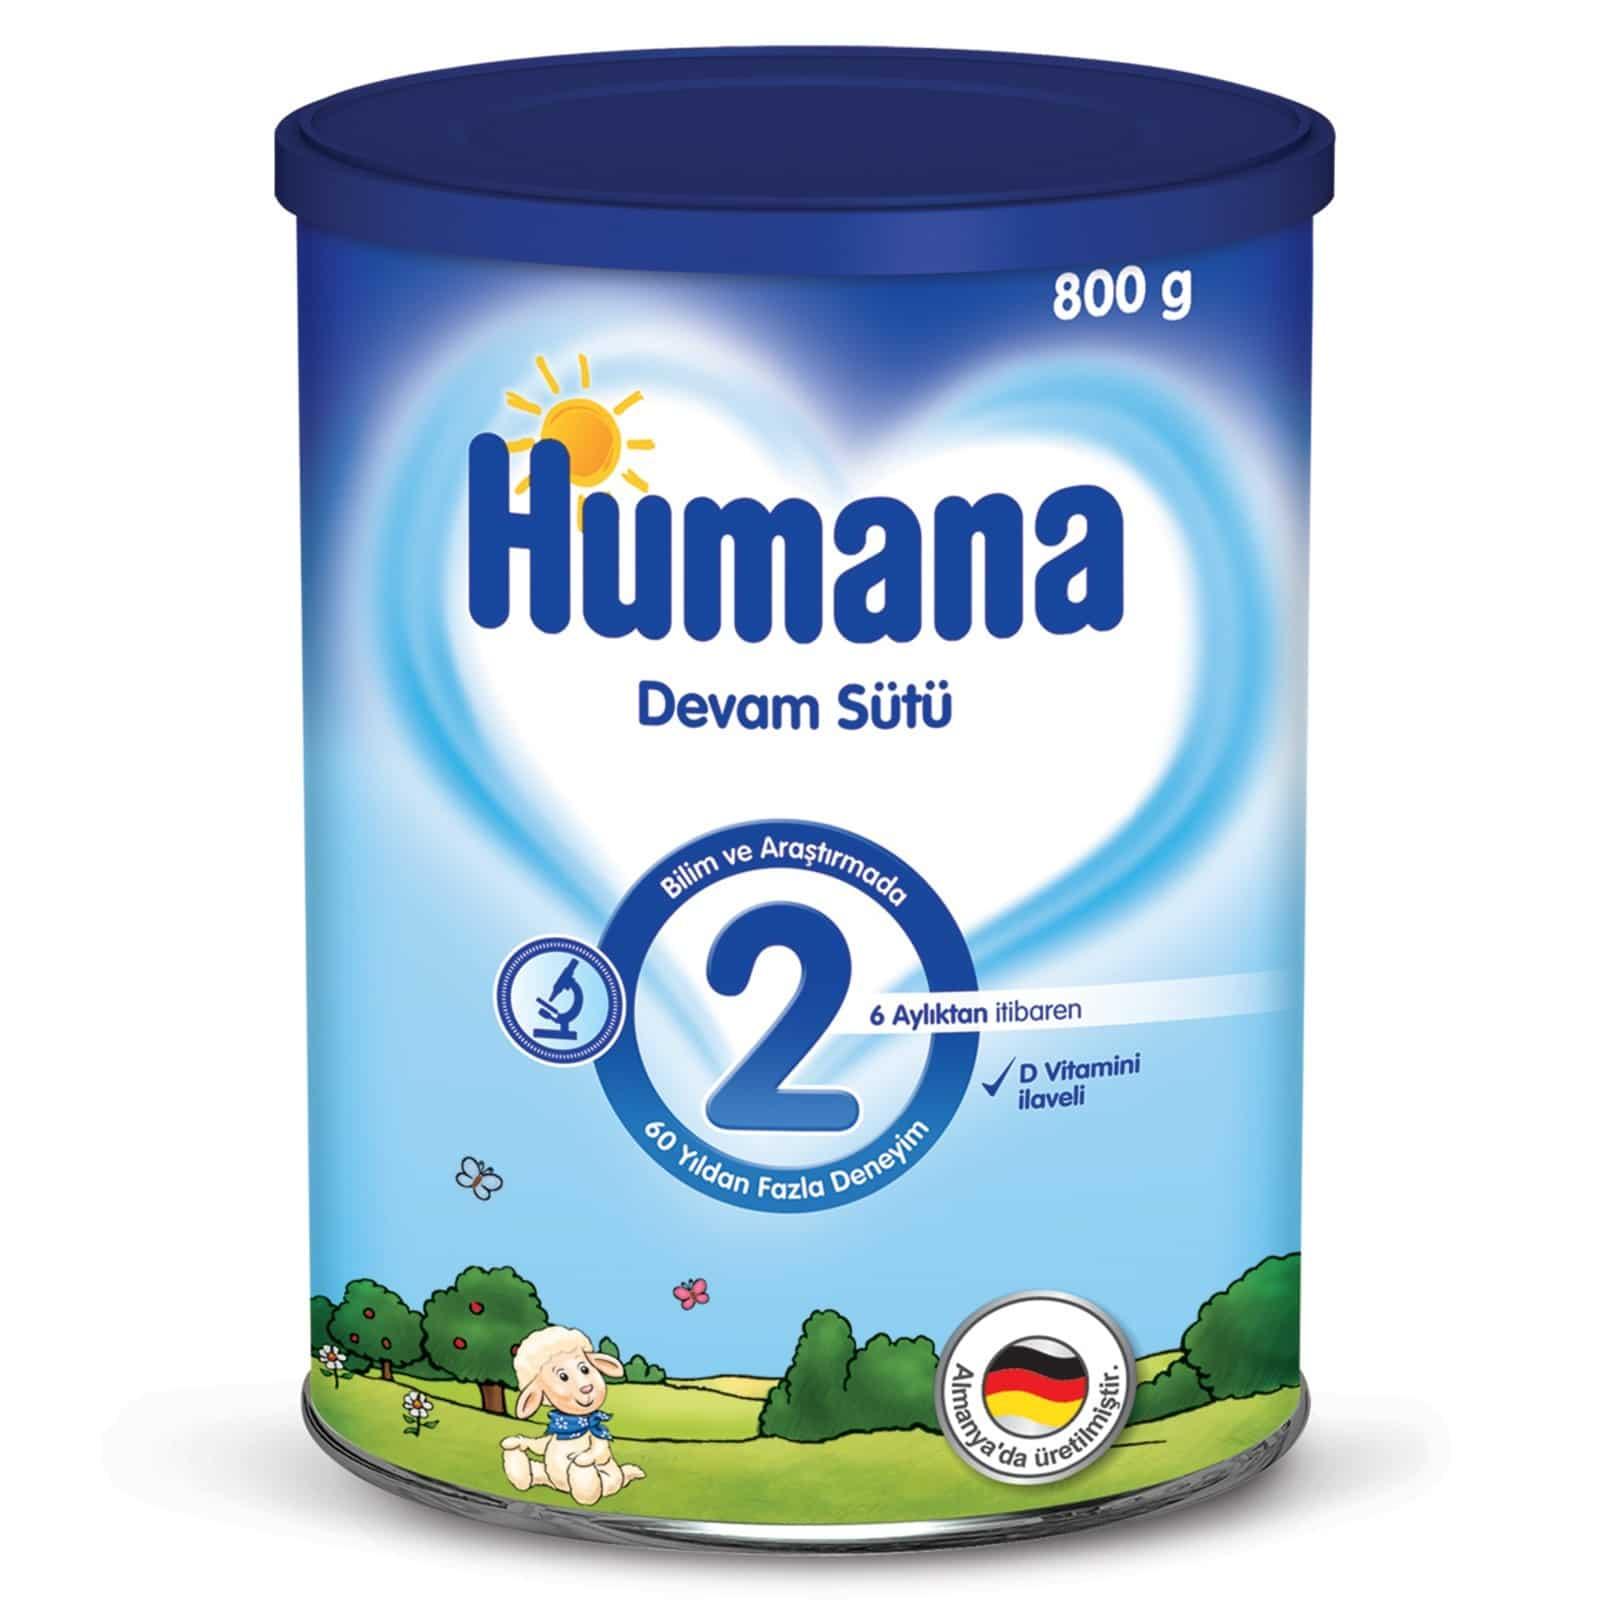 Humana Devam Sütü